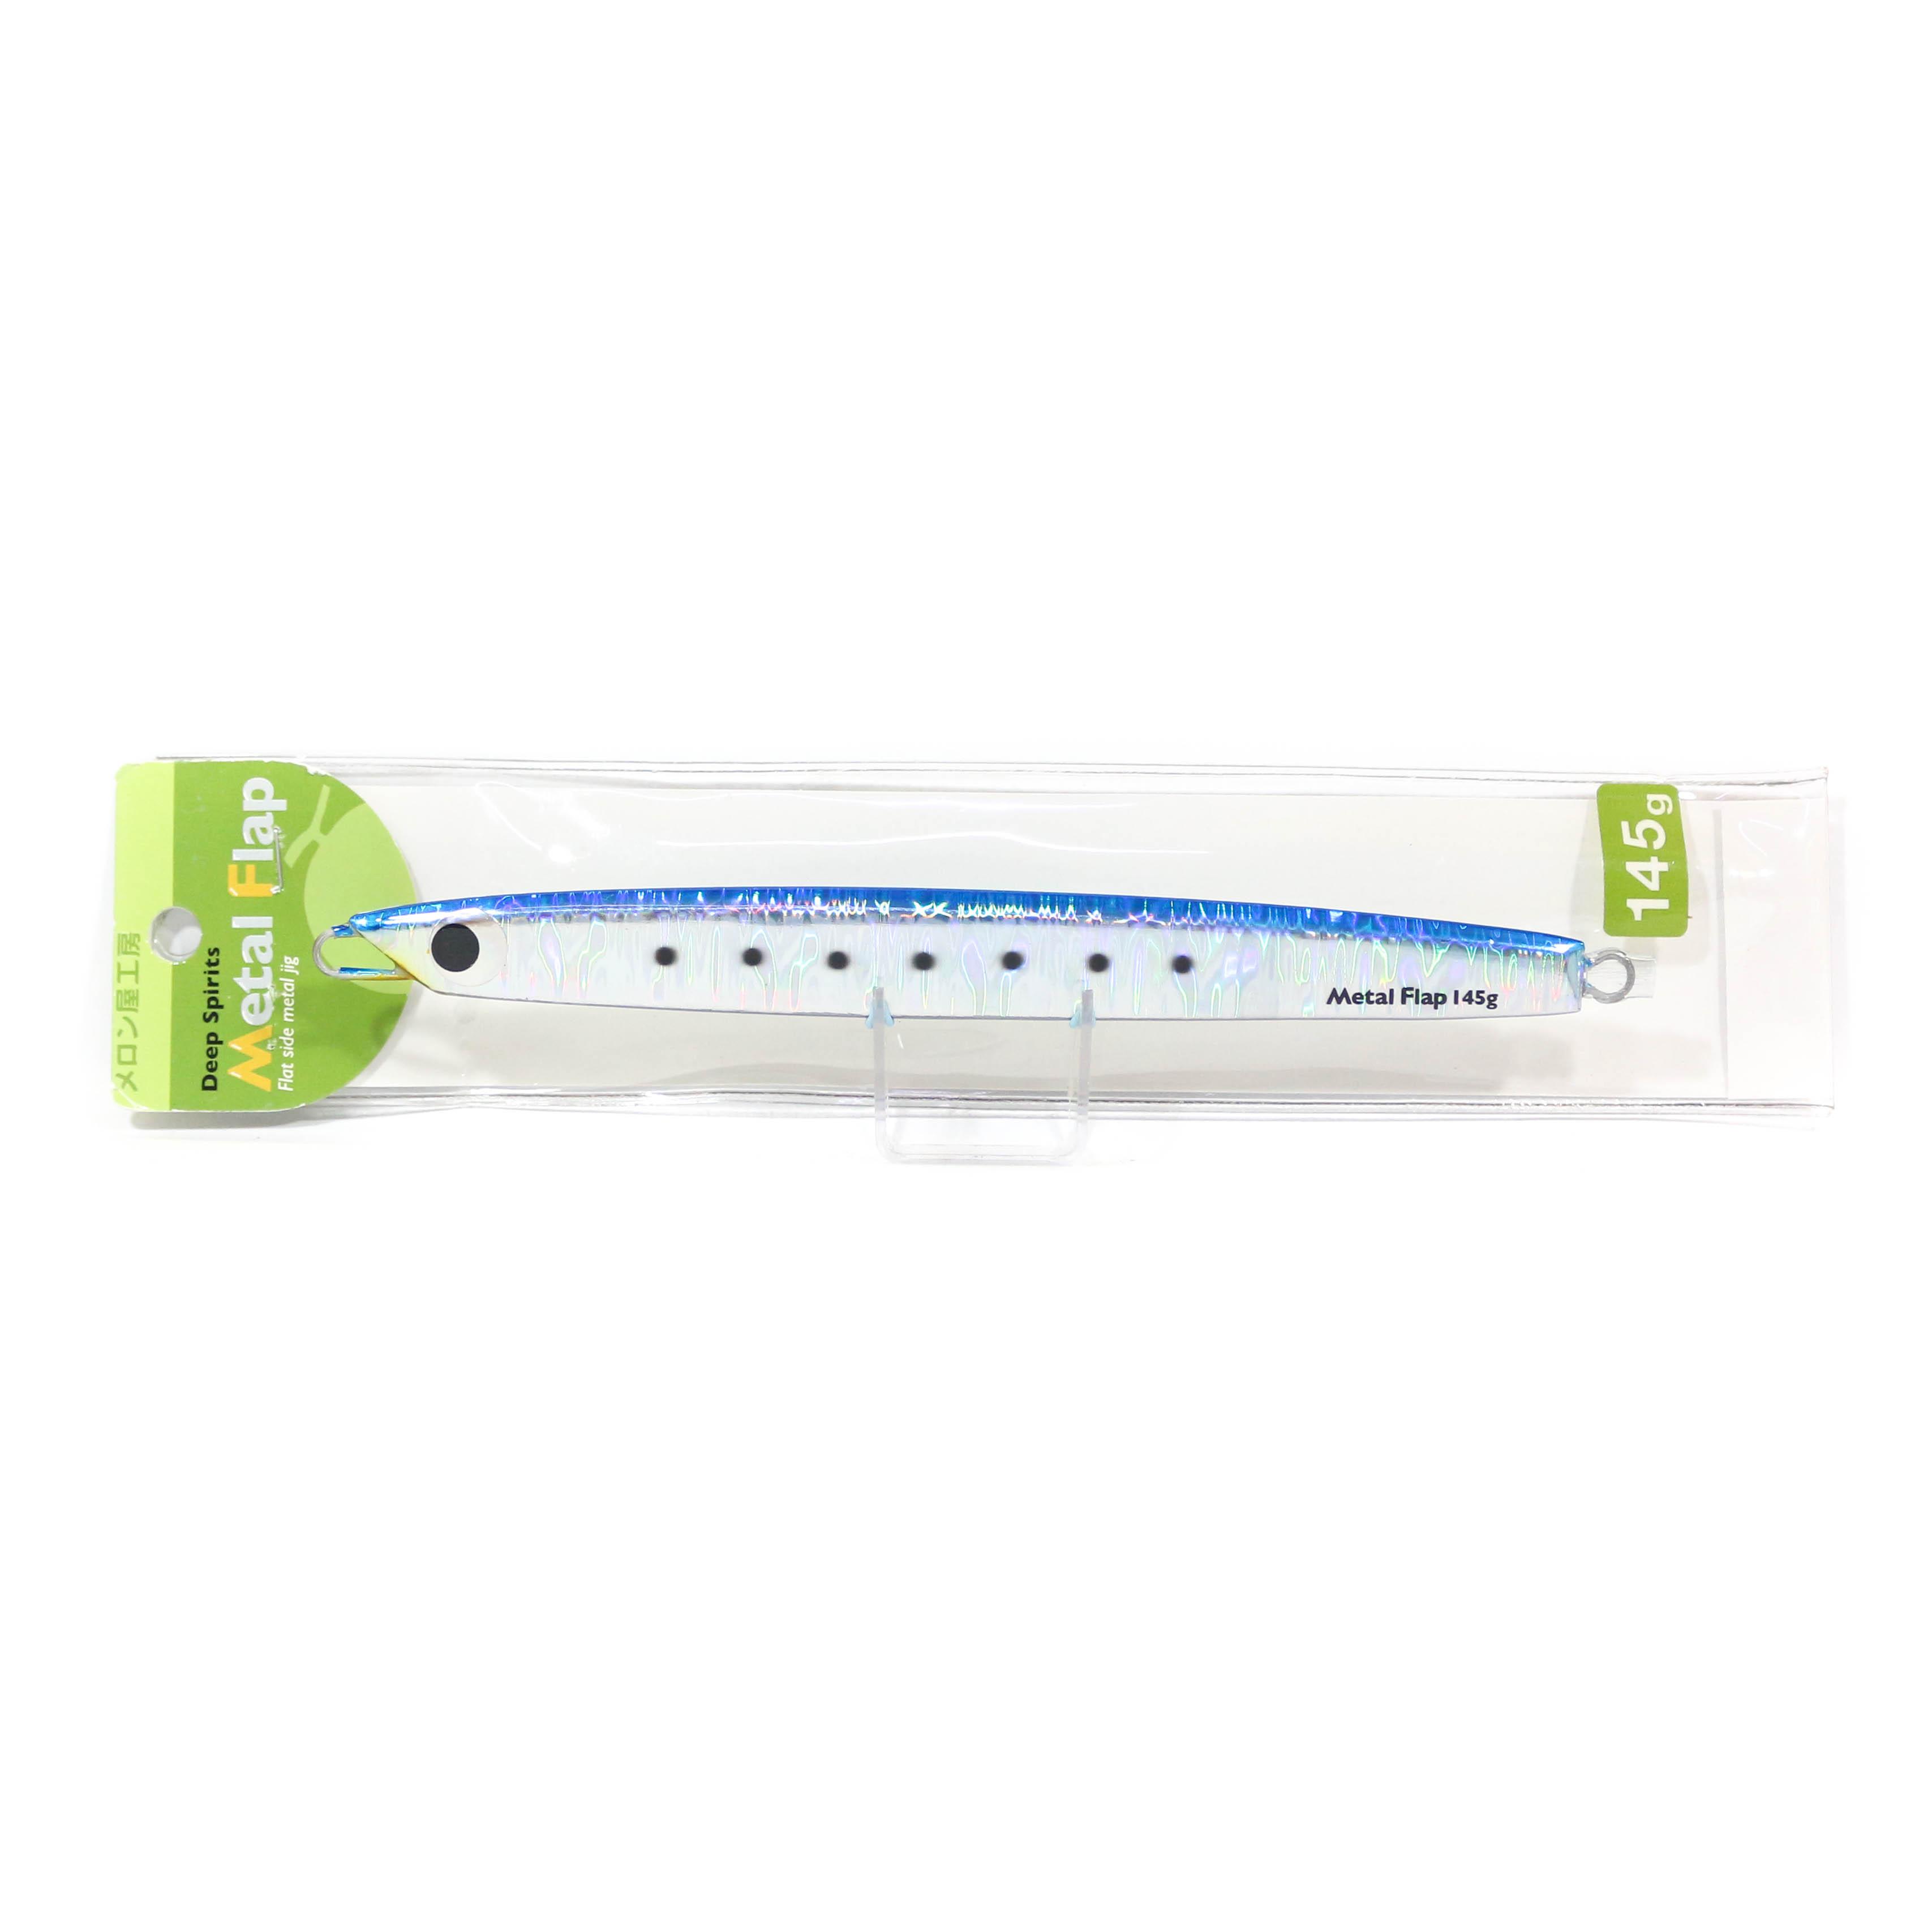 Melon Ya Metal Jig Metal Flap 145 grams Iwashi (6300)